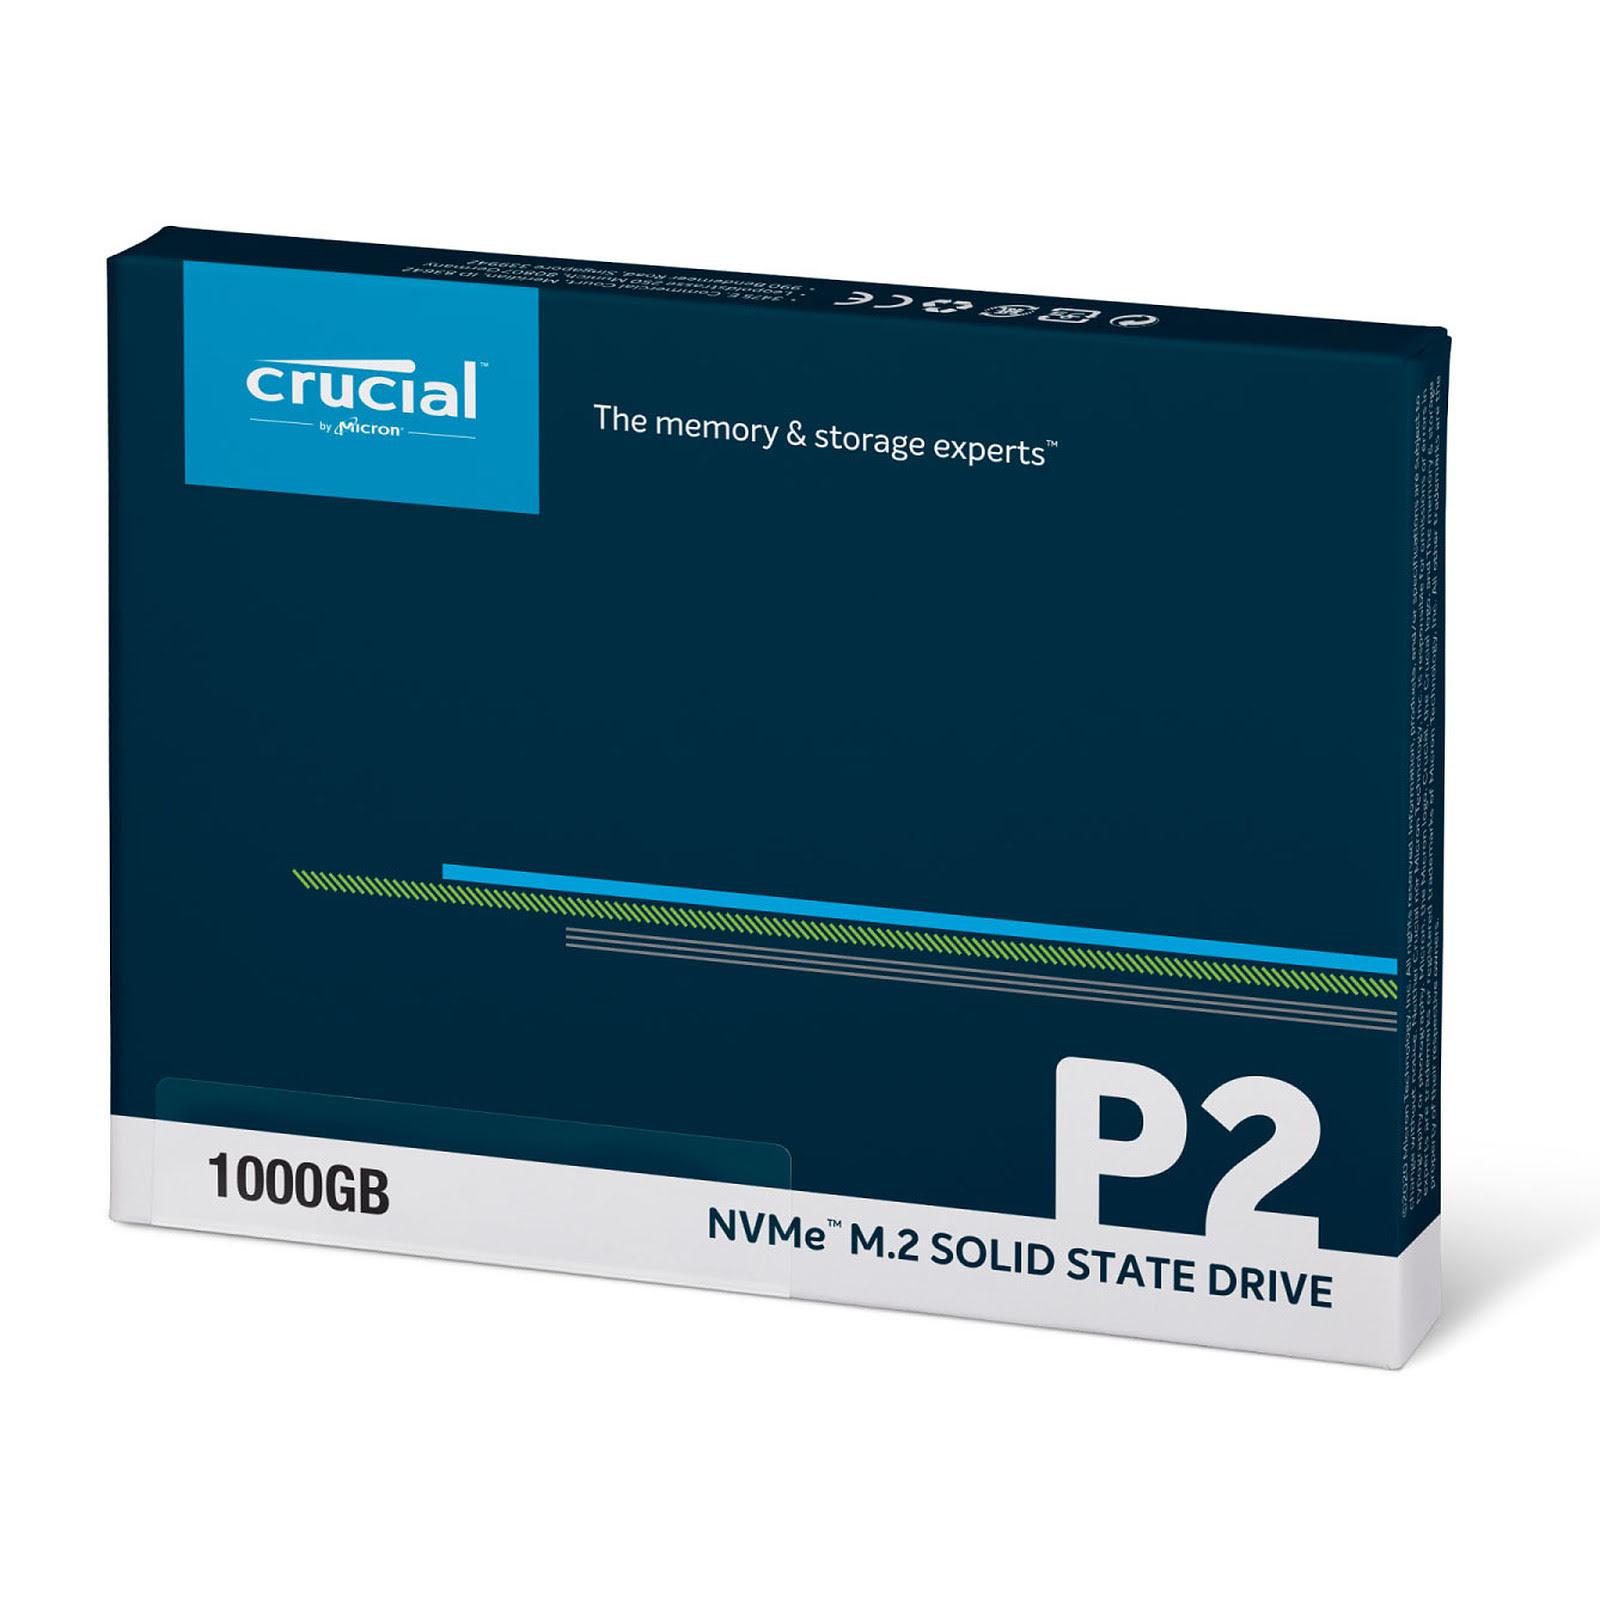 Crucial P2 960Go-1To M.2 - Disque SSD Crucial - Cybertek.fr - 1